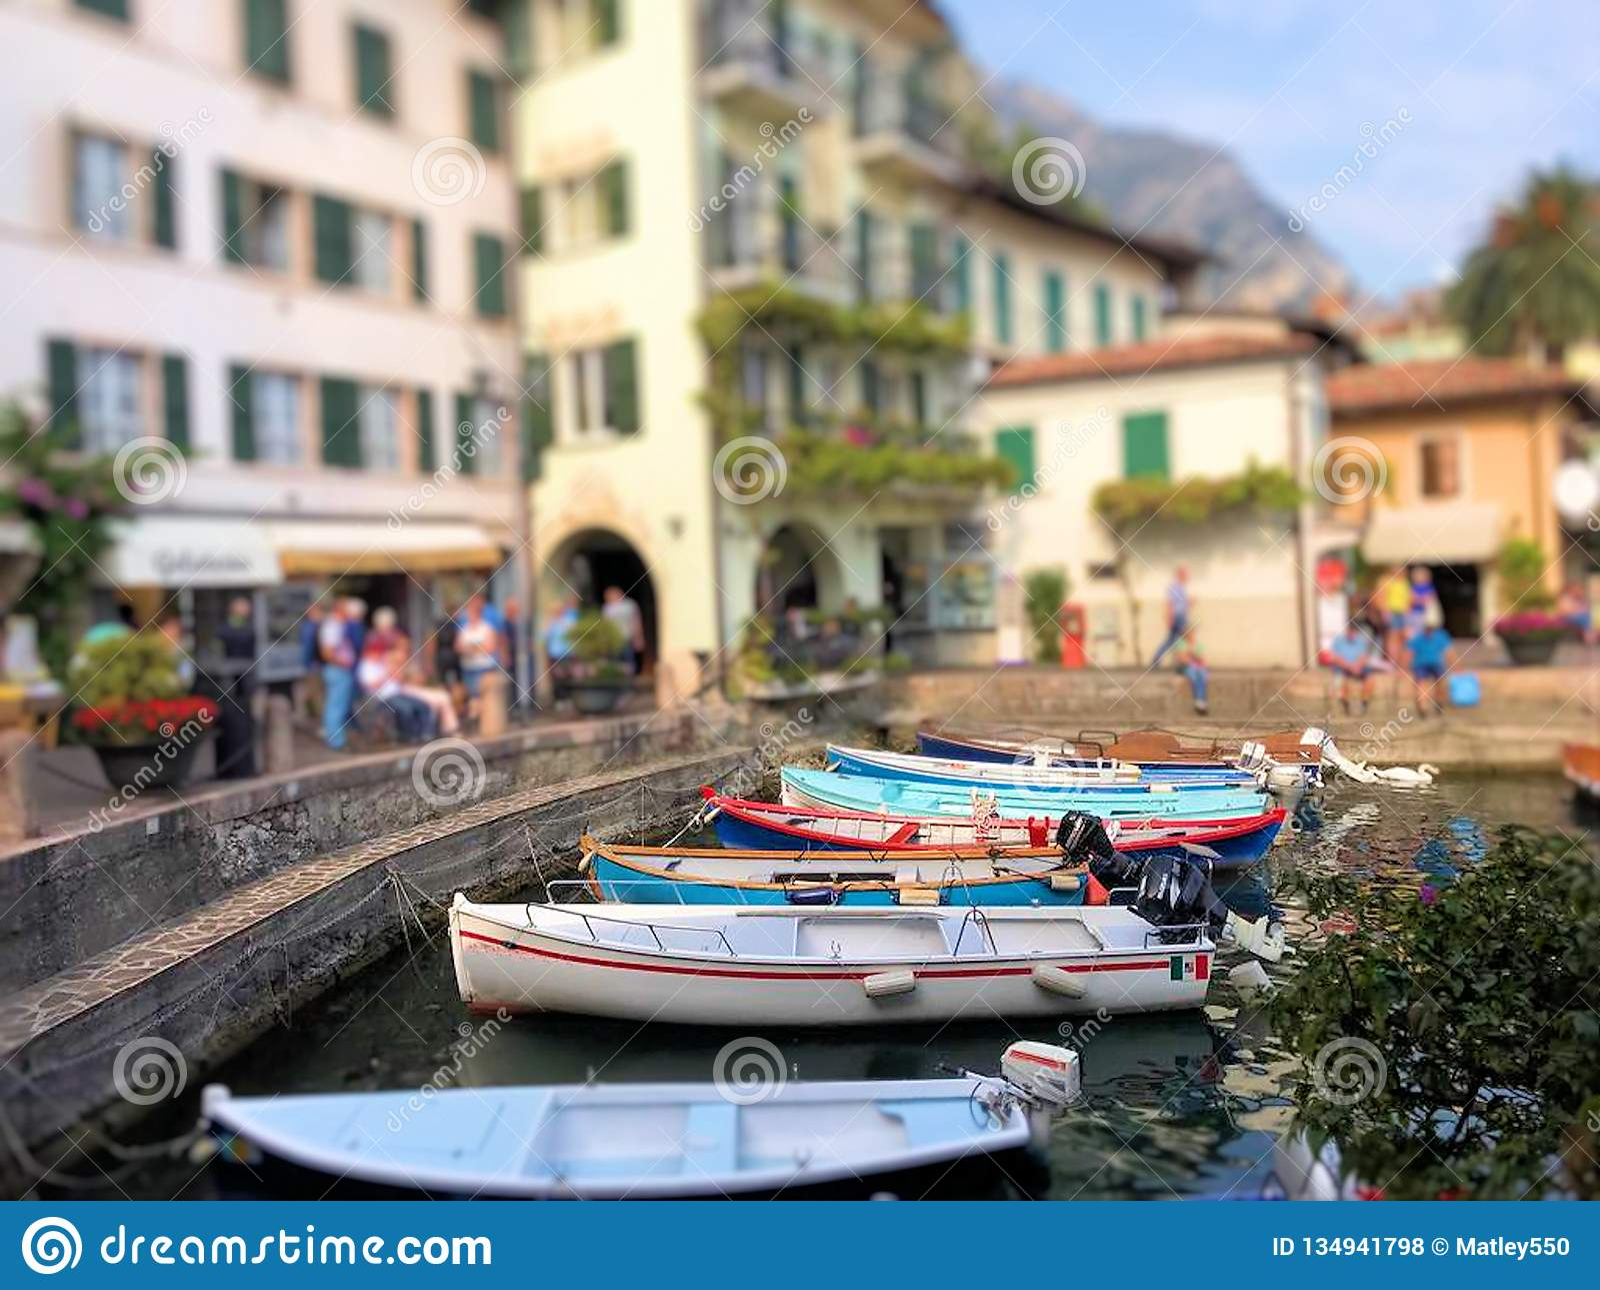 Boats in the marina of Limone sul Garda